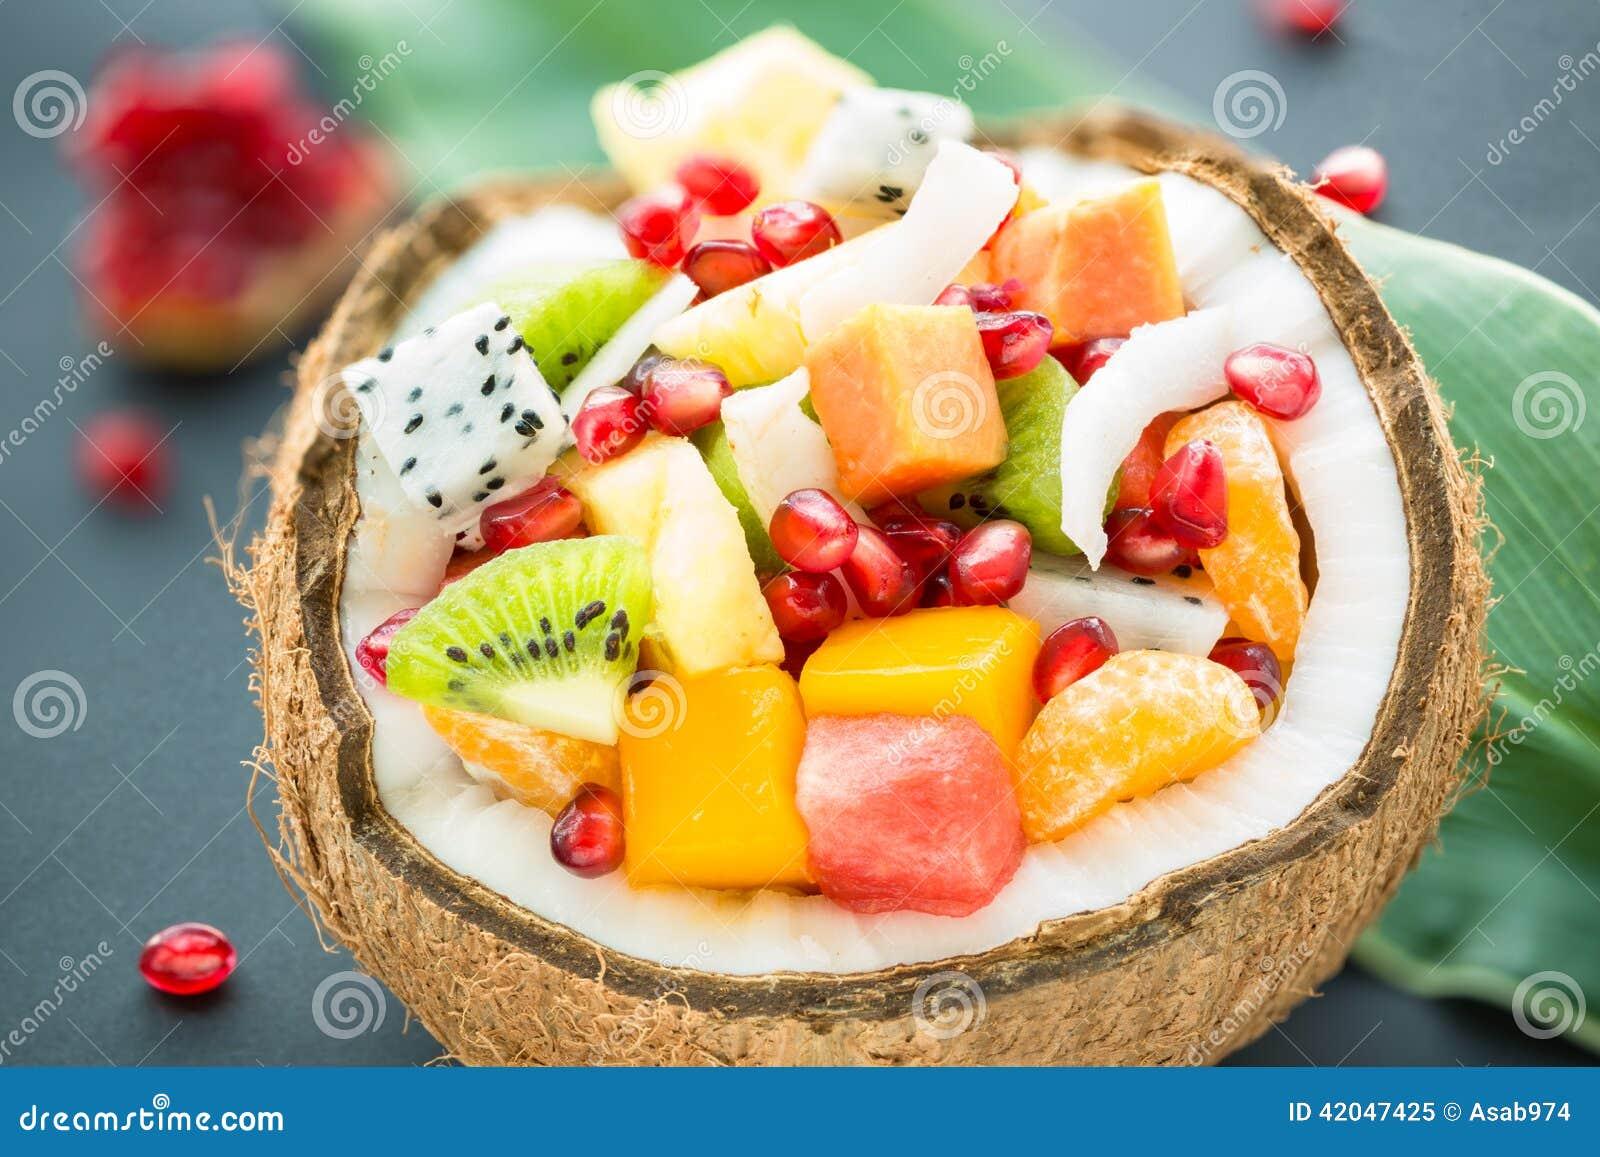 Insalata di frutta esotica